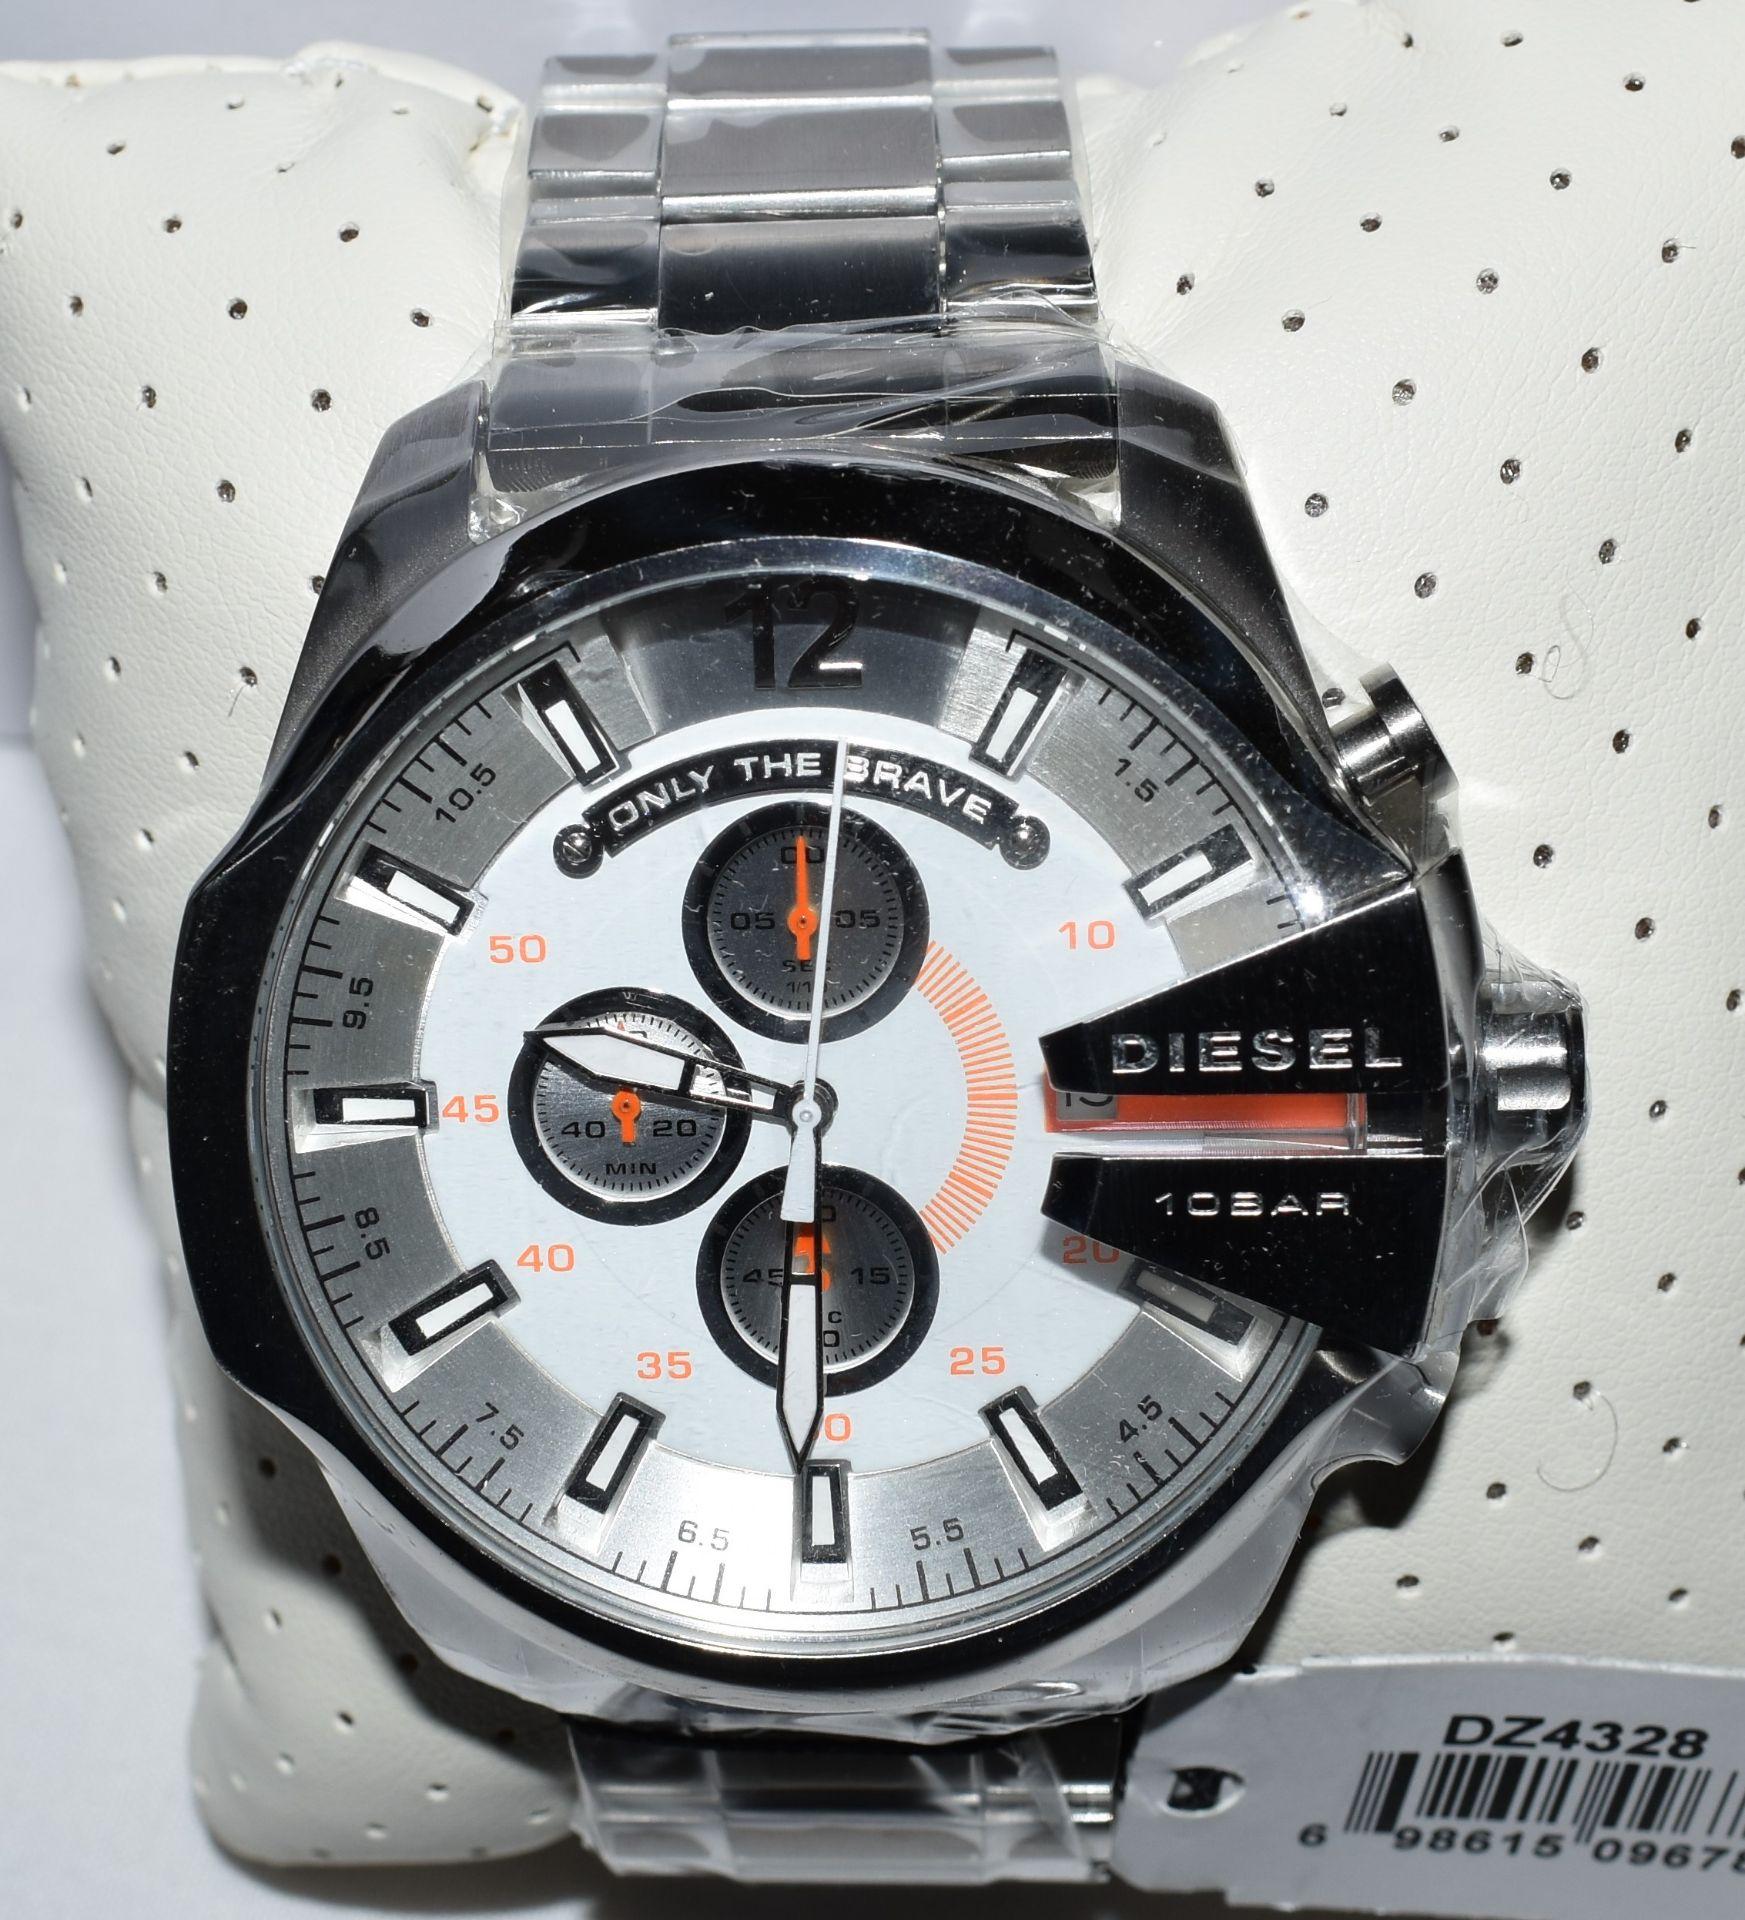 Diesel Men's Watch DZ4328 - Image 2 of 3